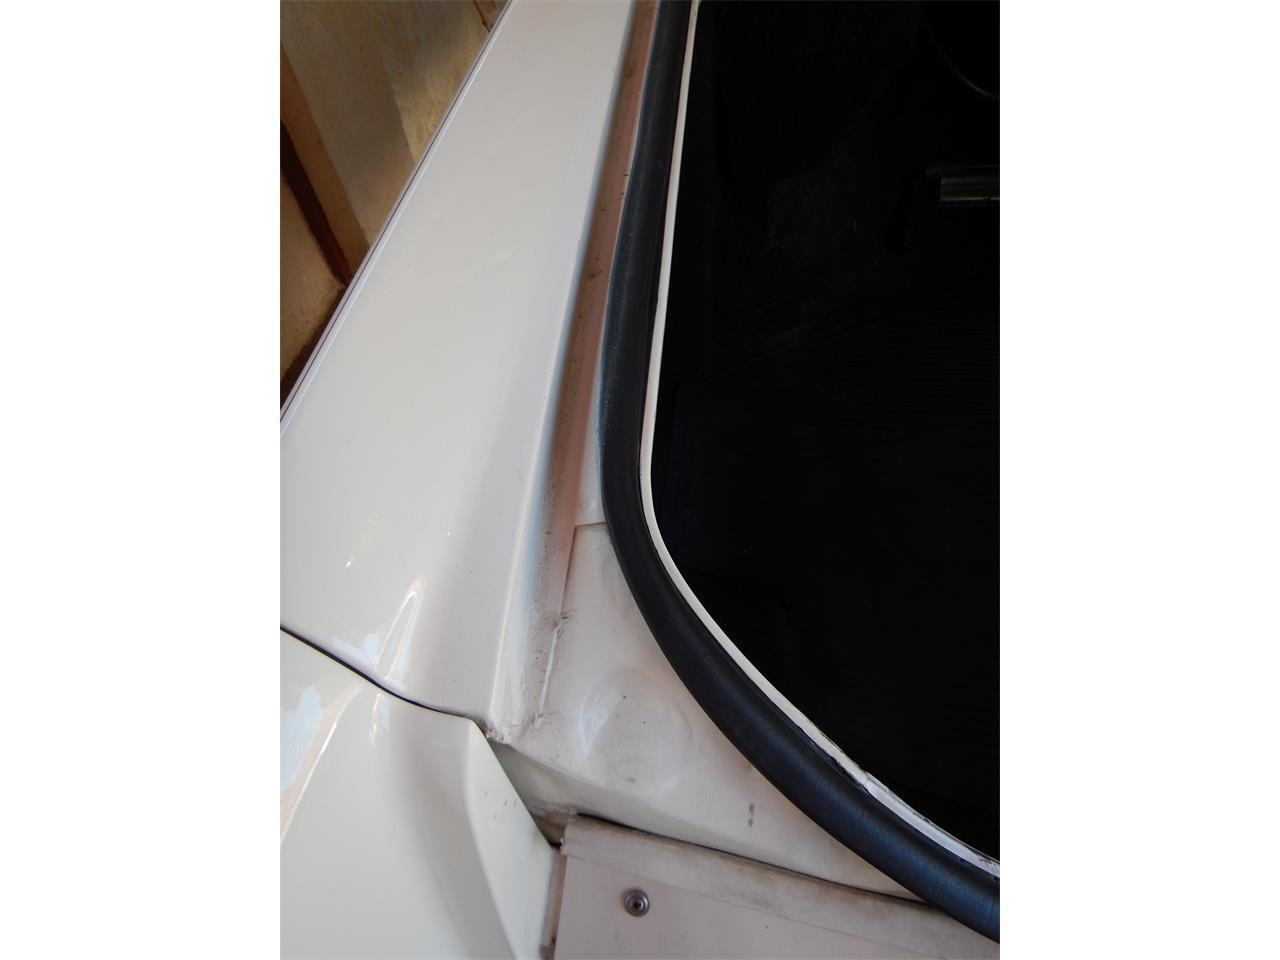 1978 Cadillac Eldorado Biarritz (CC-1207447) for sale in woodland hills, California